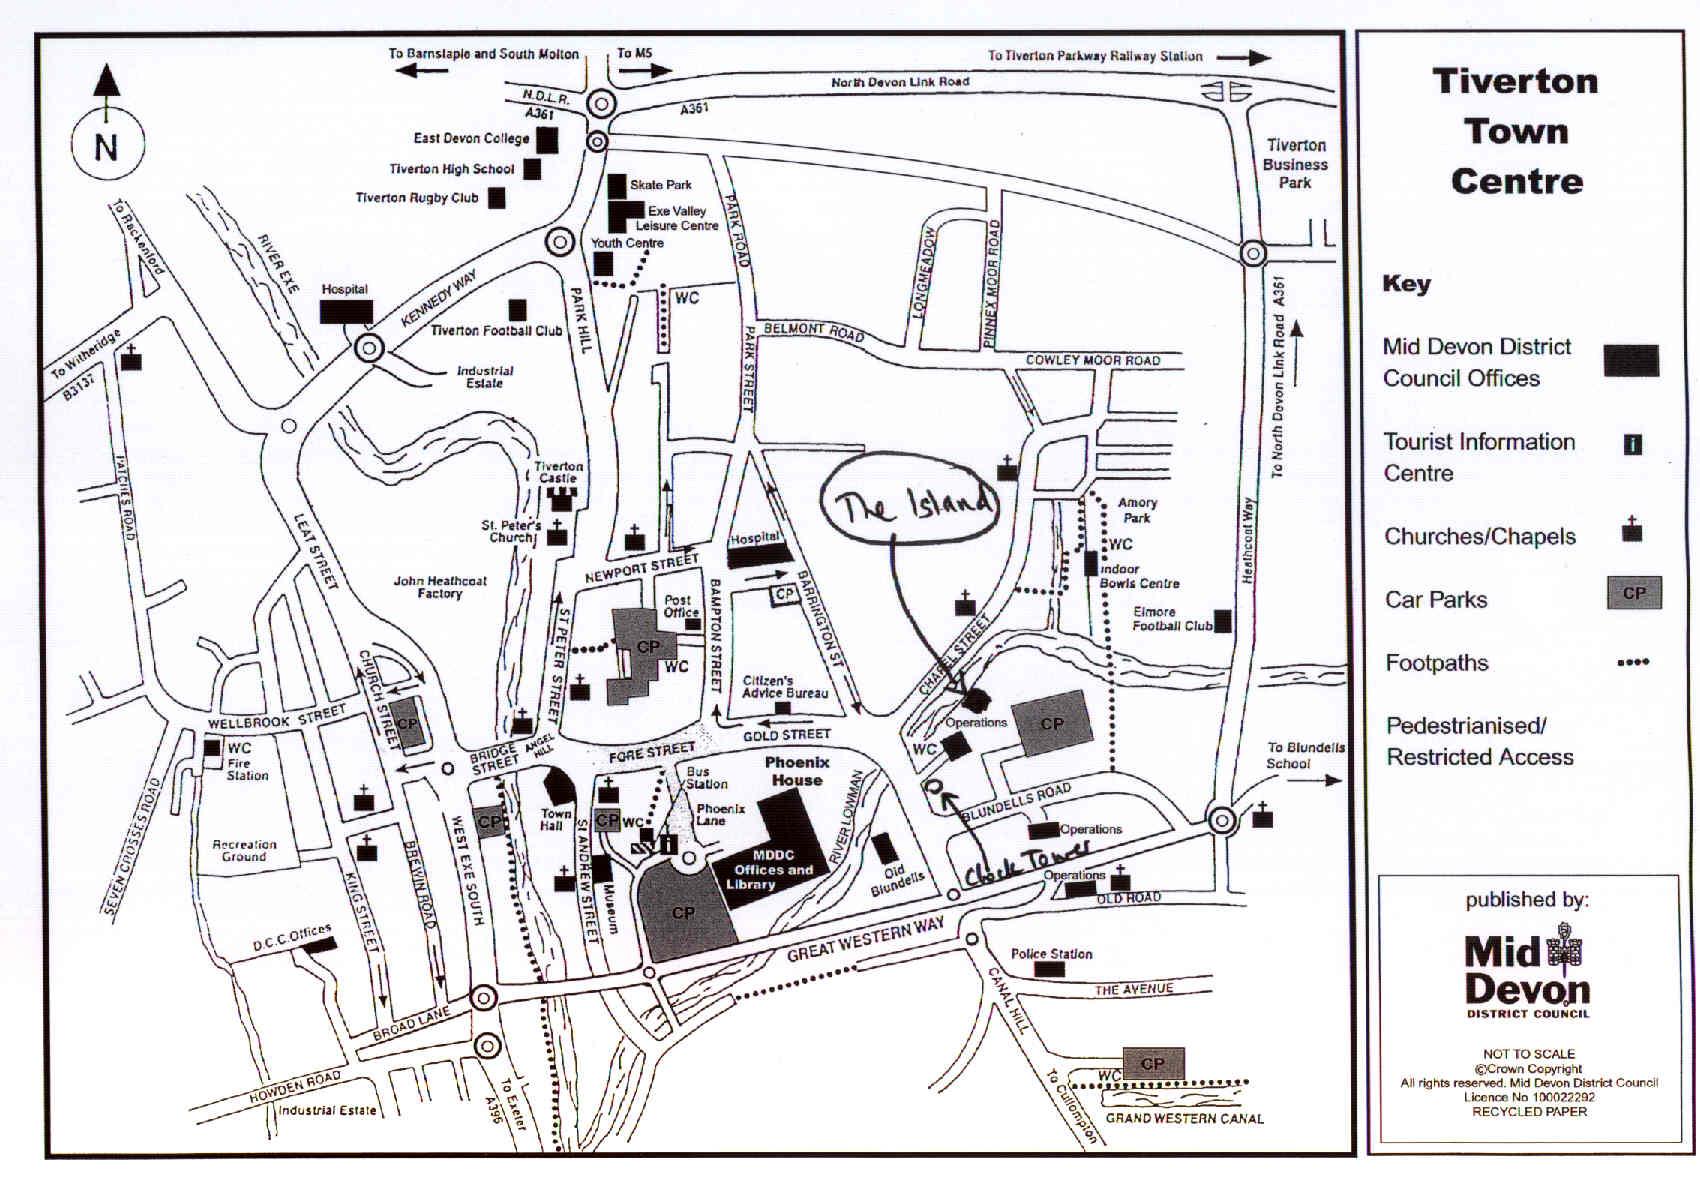 Tiverton Town Center Map